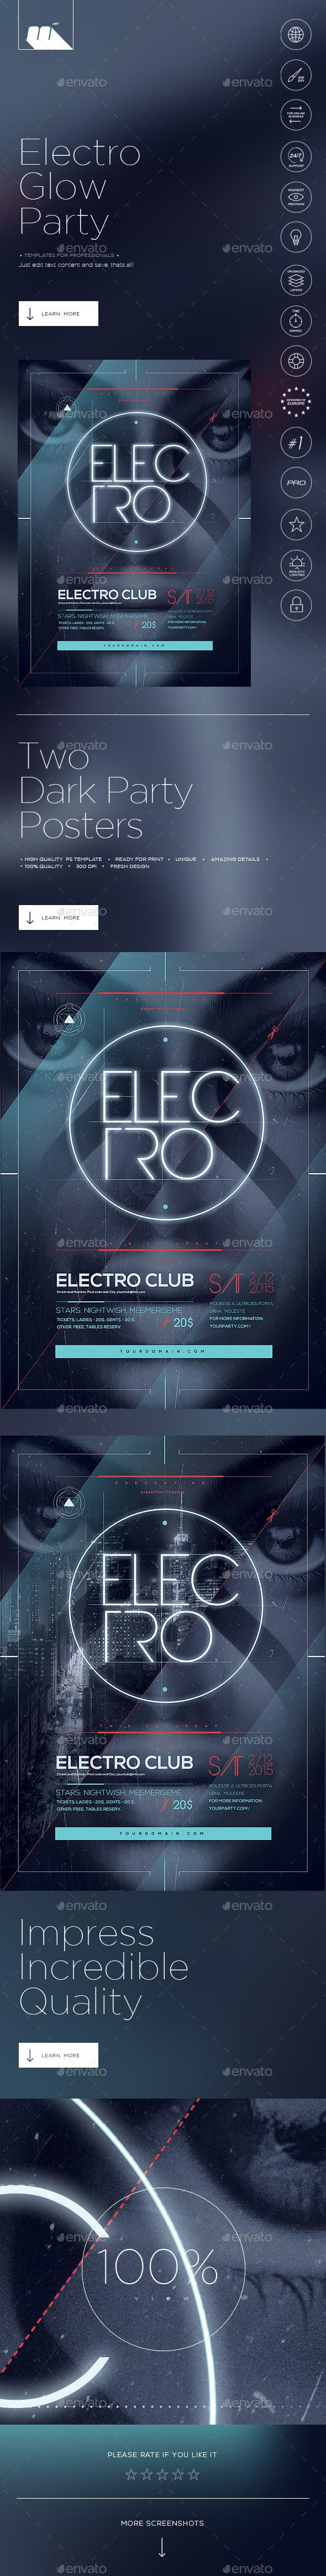 Electro Glow Poster